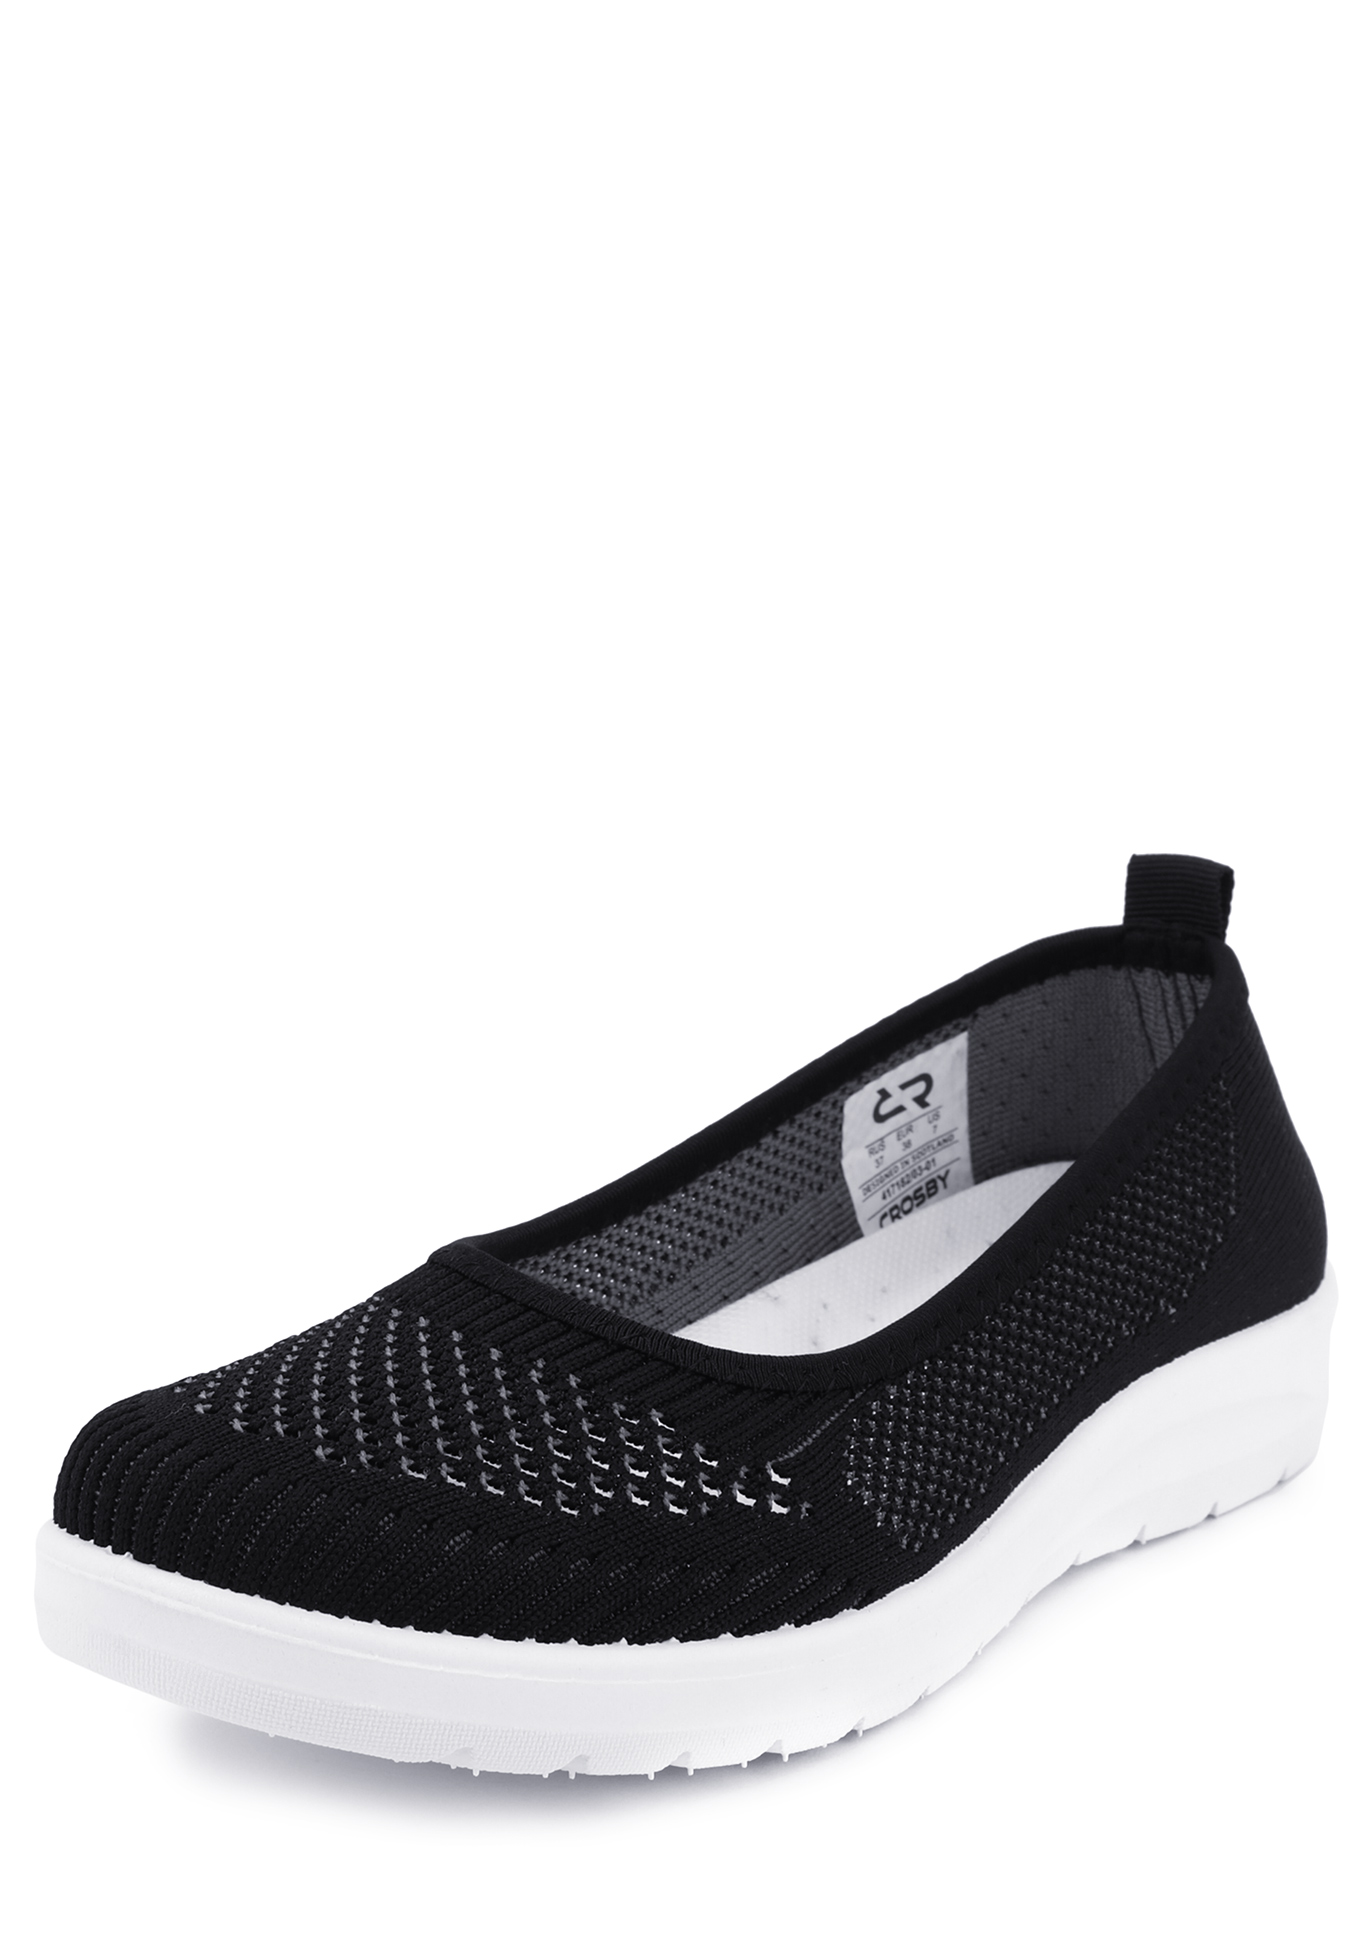 Туфли женские Клариса